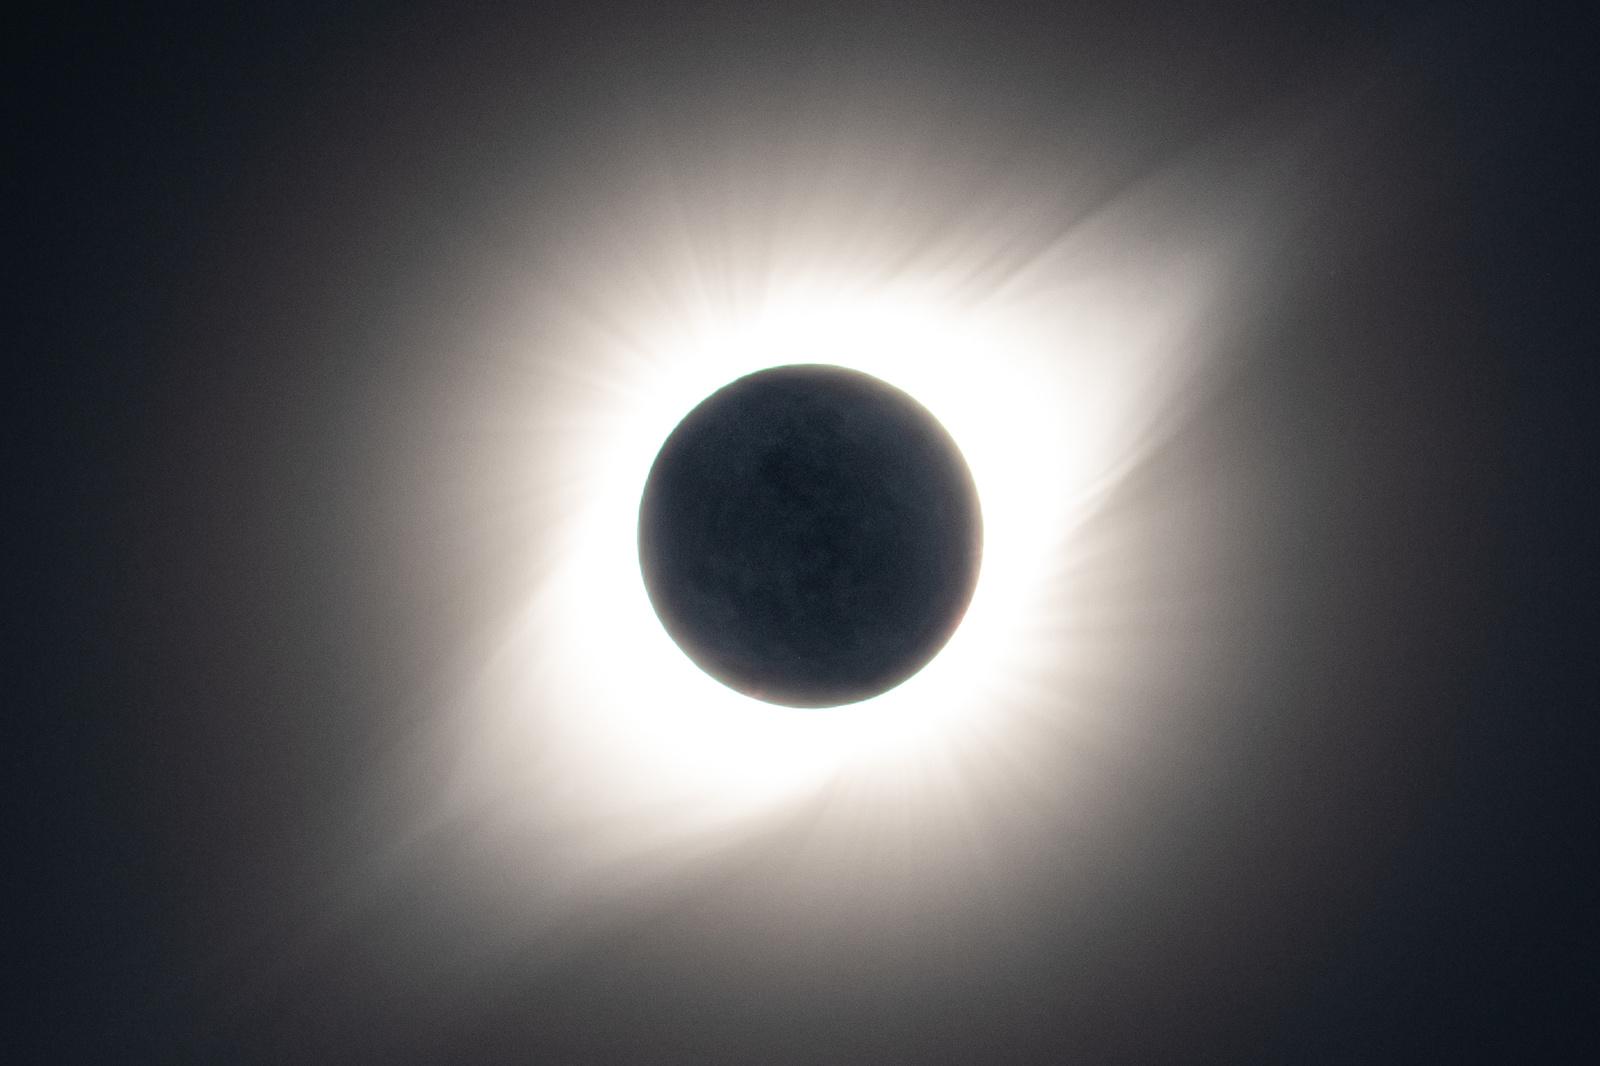 _MGL8504-earthshine.thumb.jpg.4fd96dd3427014817fbe5ad7afd46b20.jpg